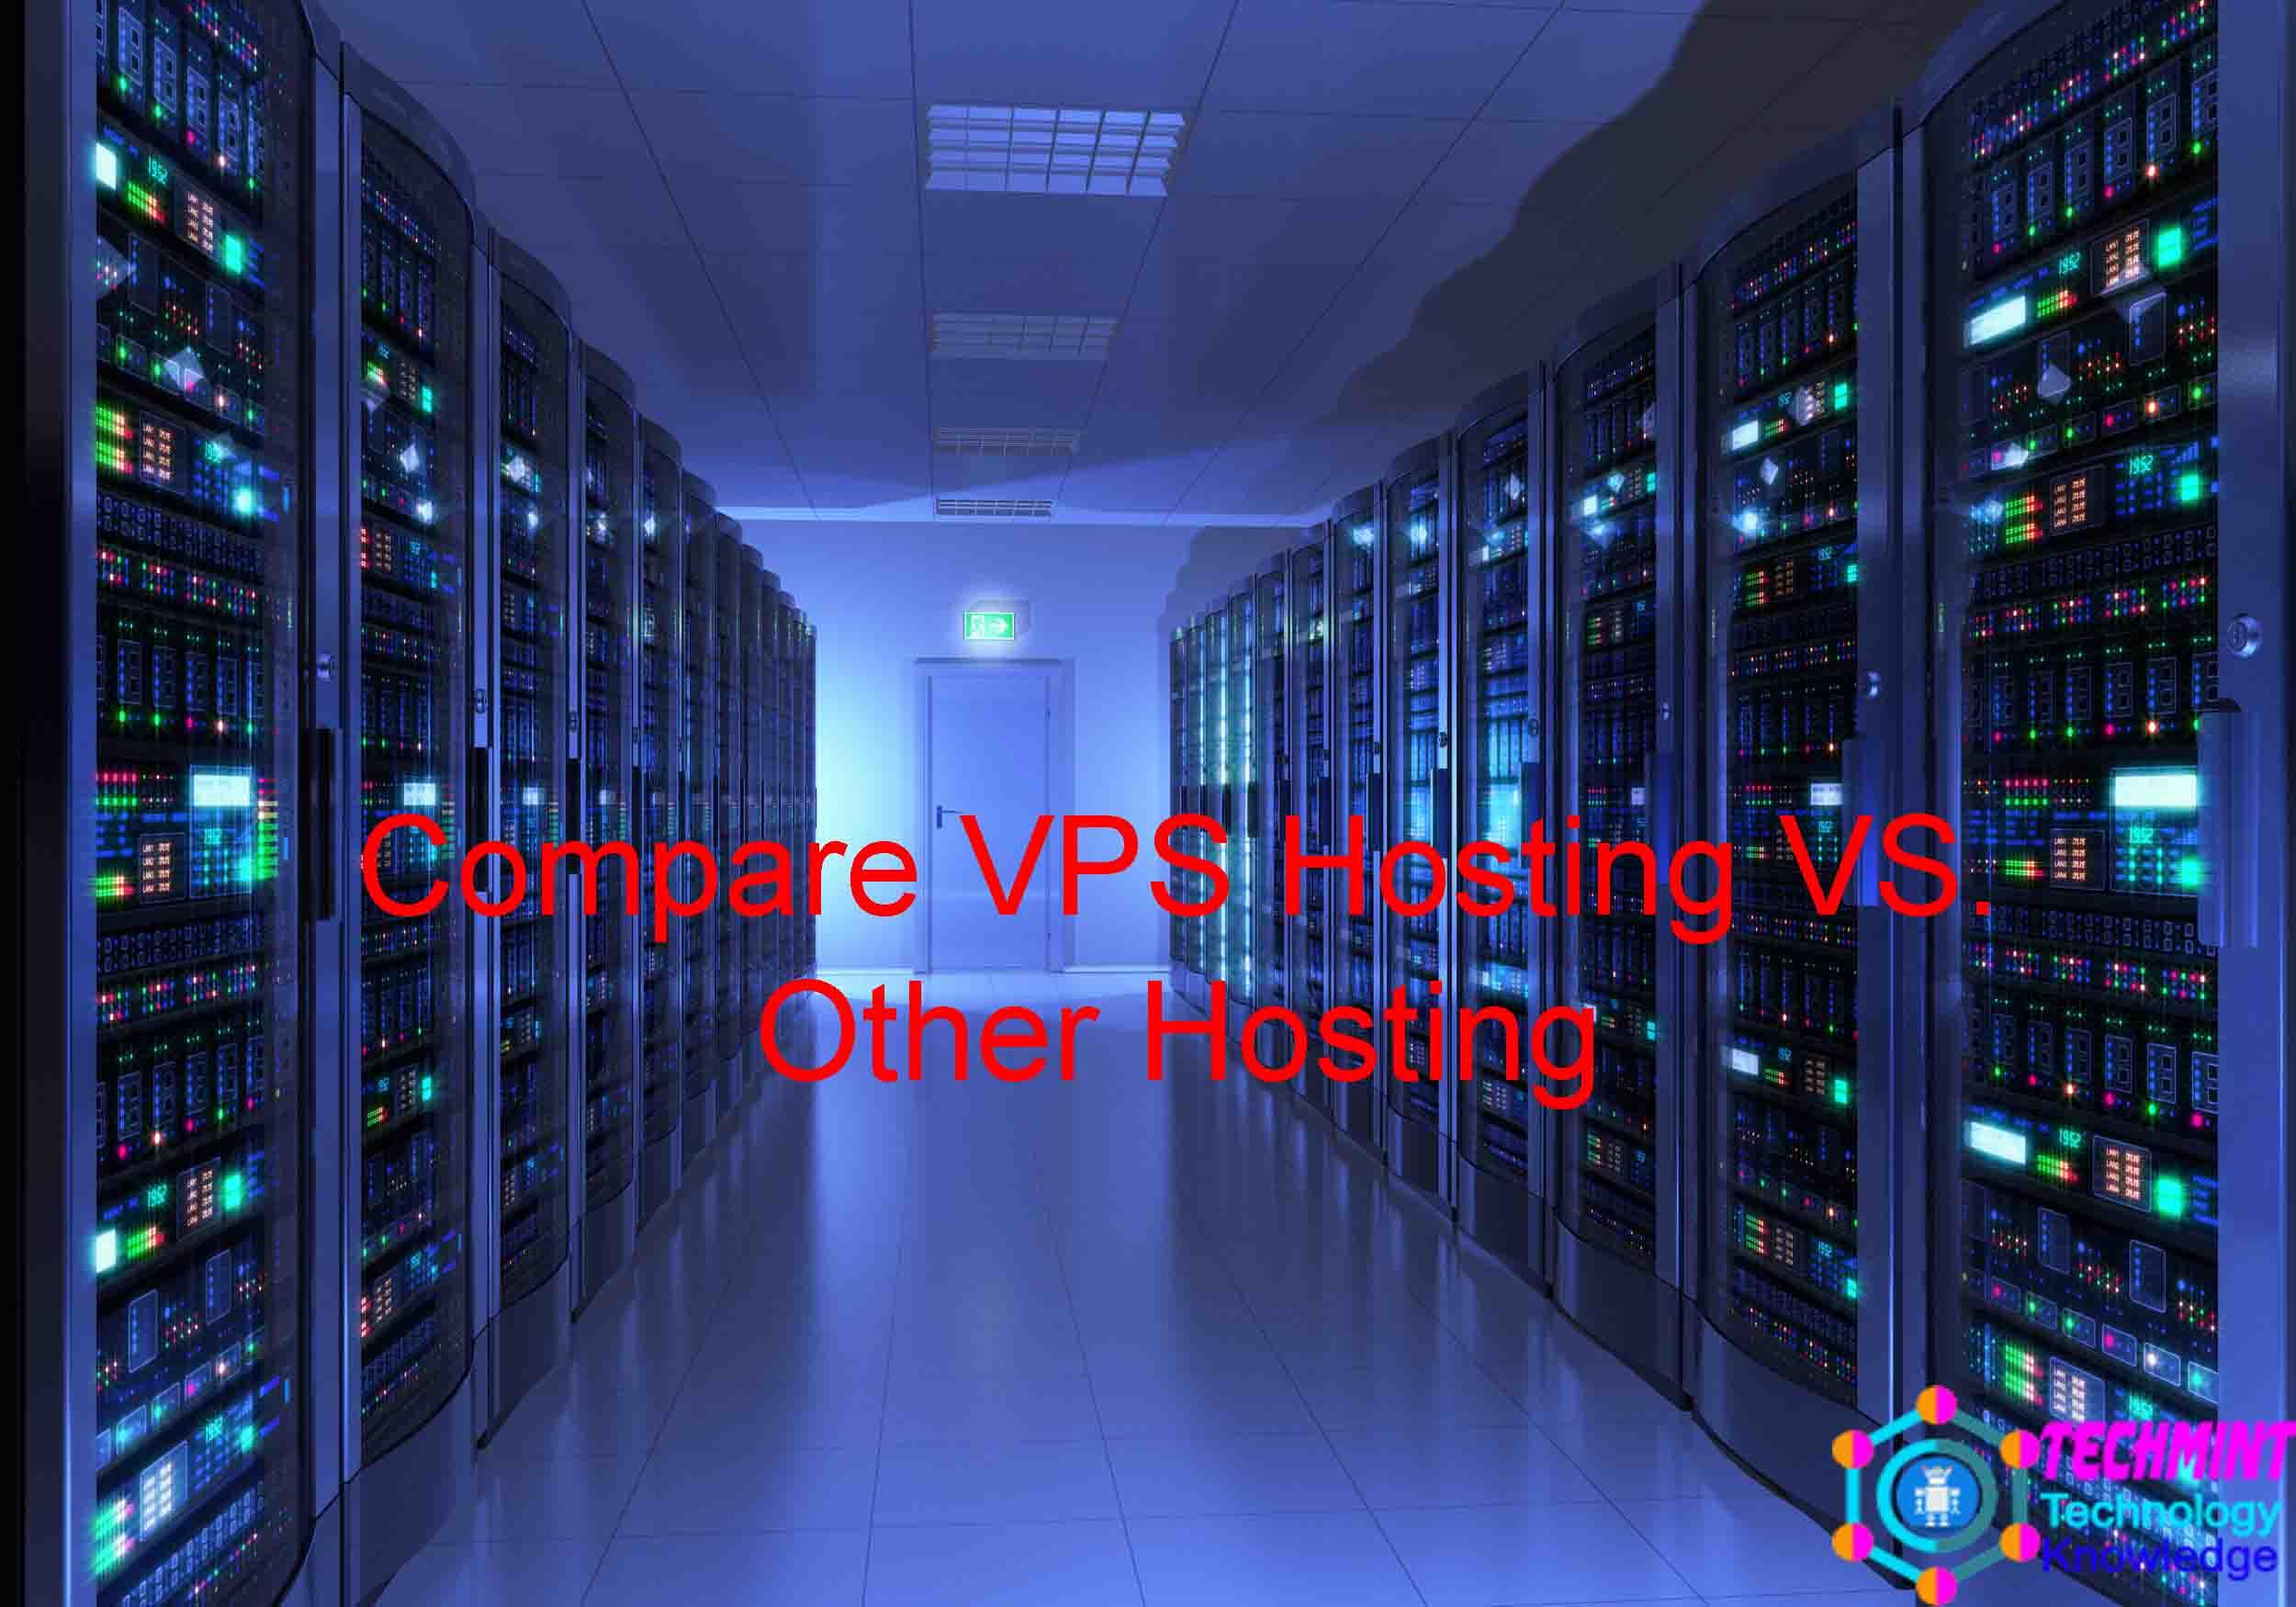 aspen-grove-studios-shared-vps-and-managed-hosting